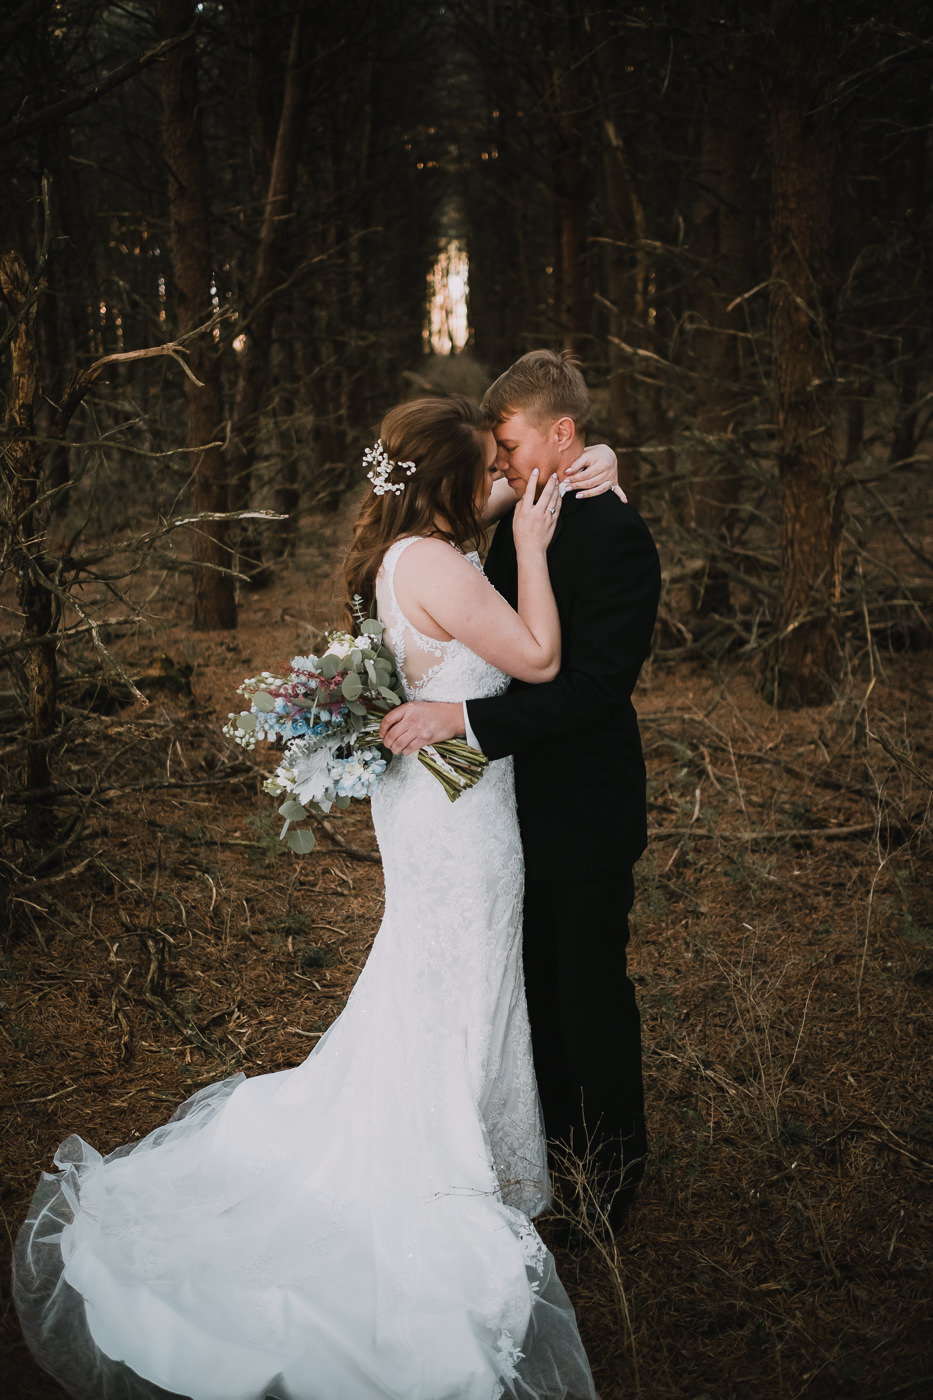 rogers.arkansas.weddingphotos.©2018mileswittboyer-22.jpg